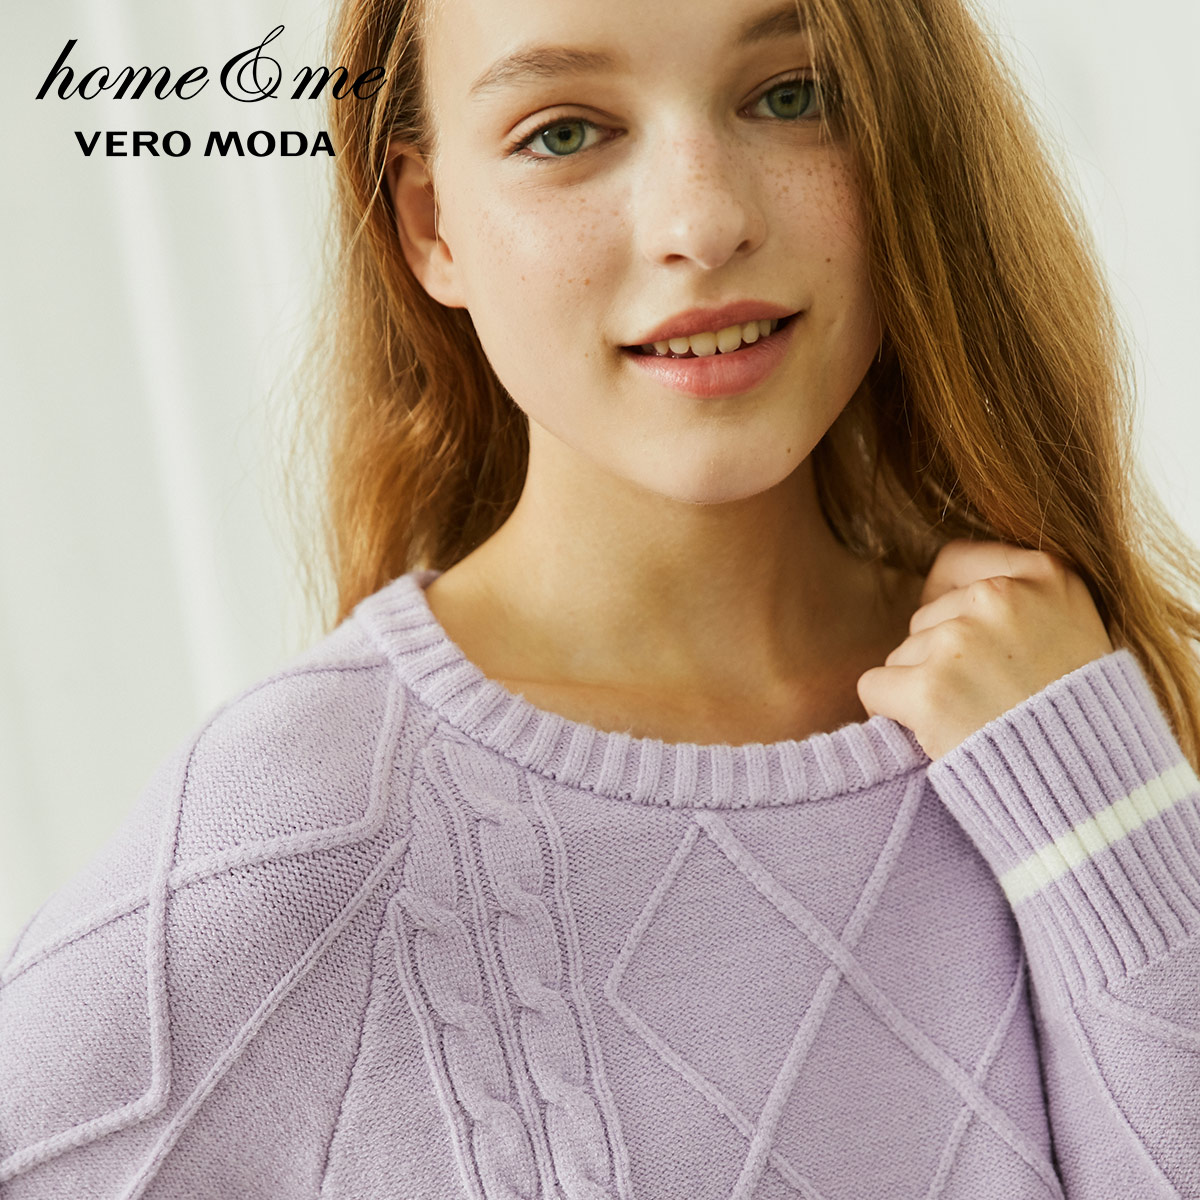 Image 4 - Vero Moda nouveau pull en tricot torsadé jambe pantalon costume homewear  3184K6501-in Ensembles de pyjama from Sous-vêtements et pyjamas on AliExpress